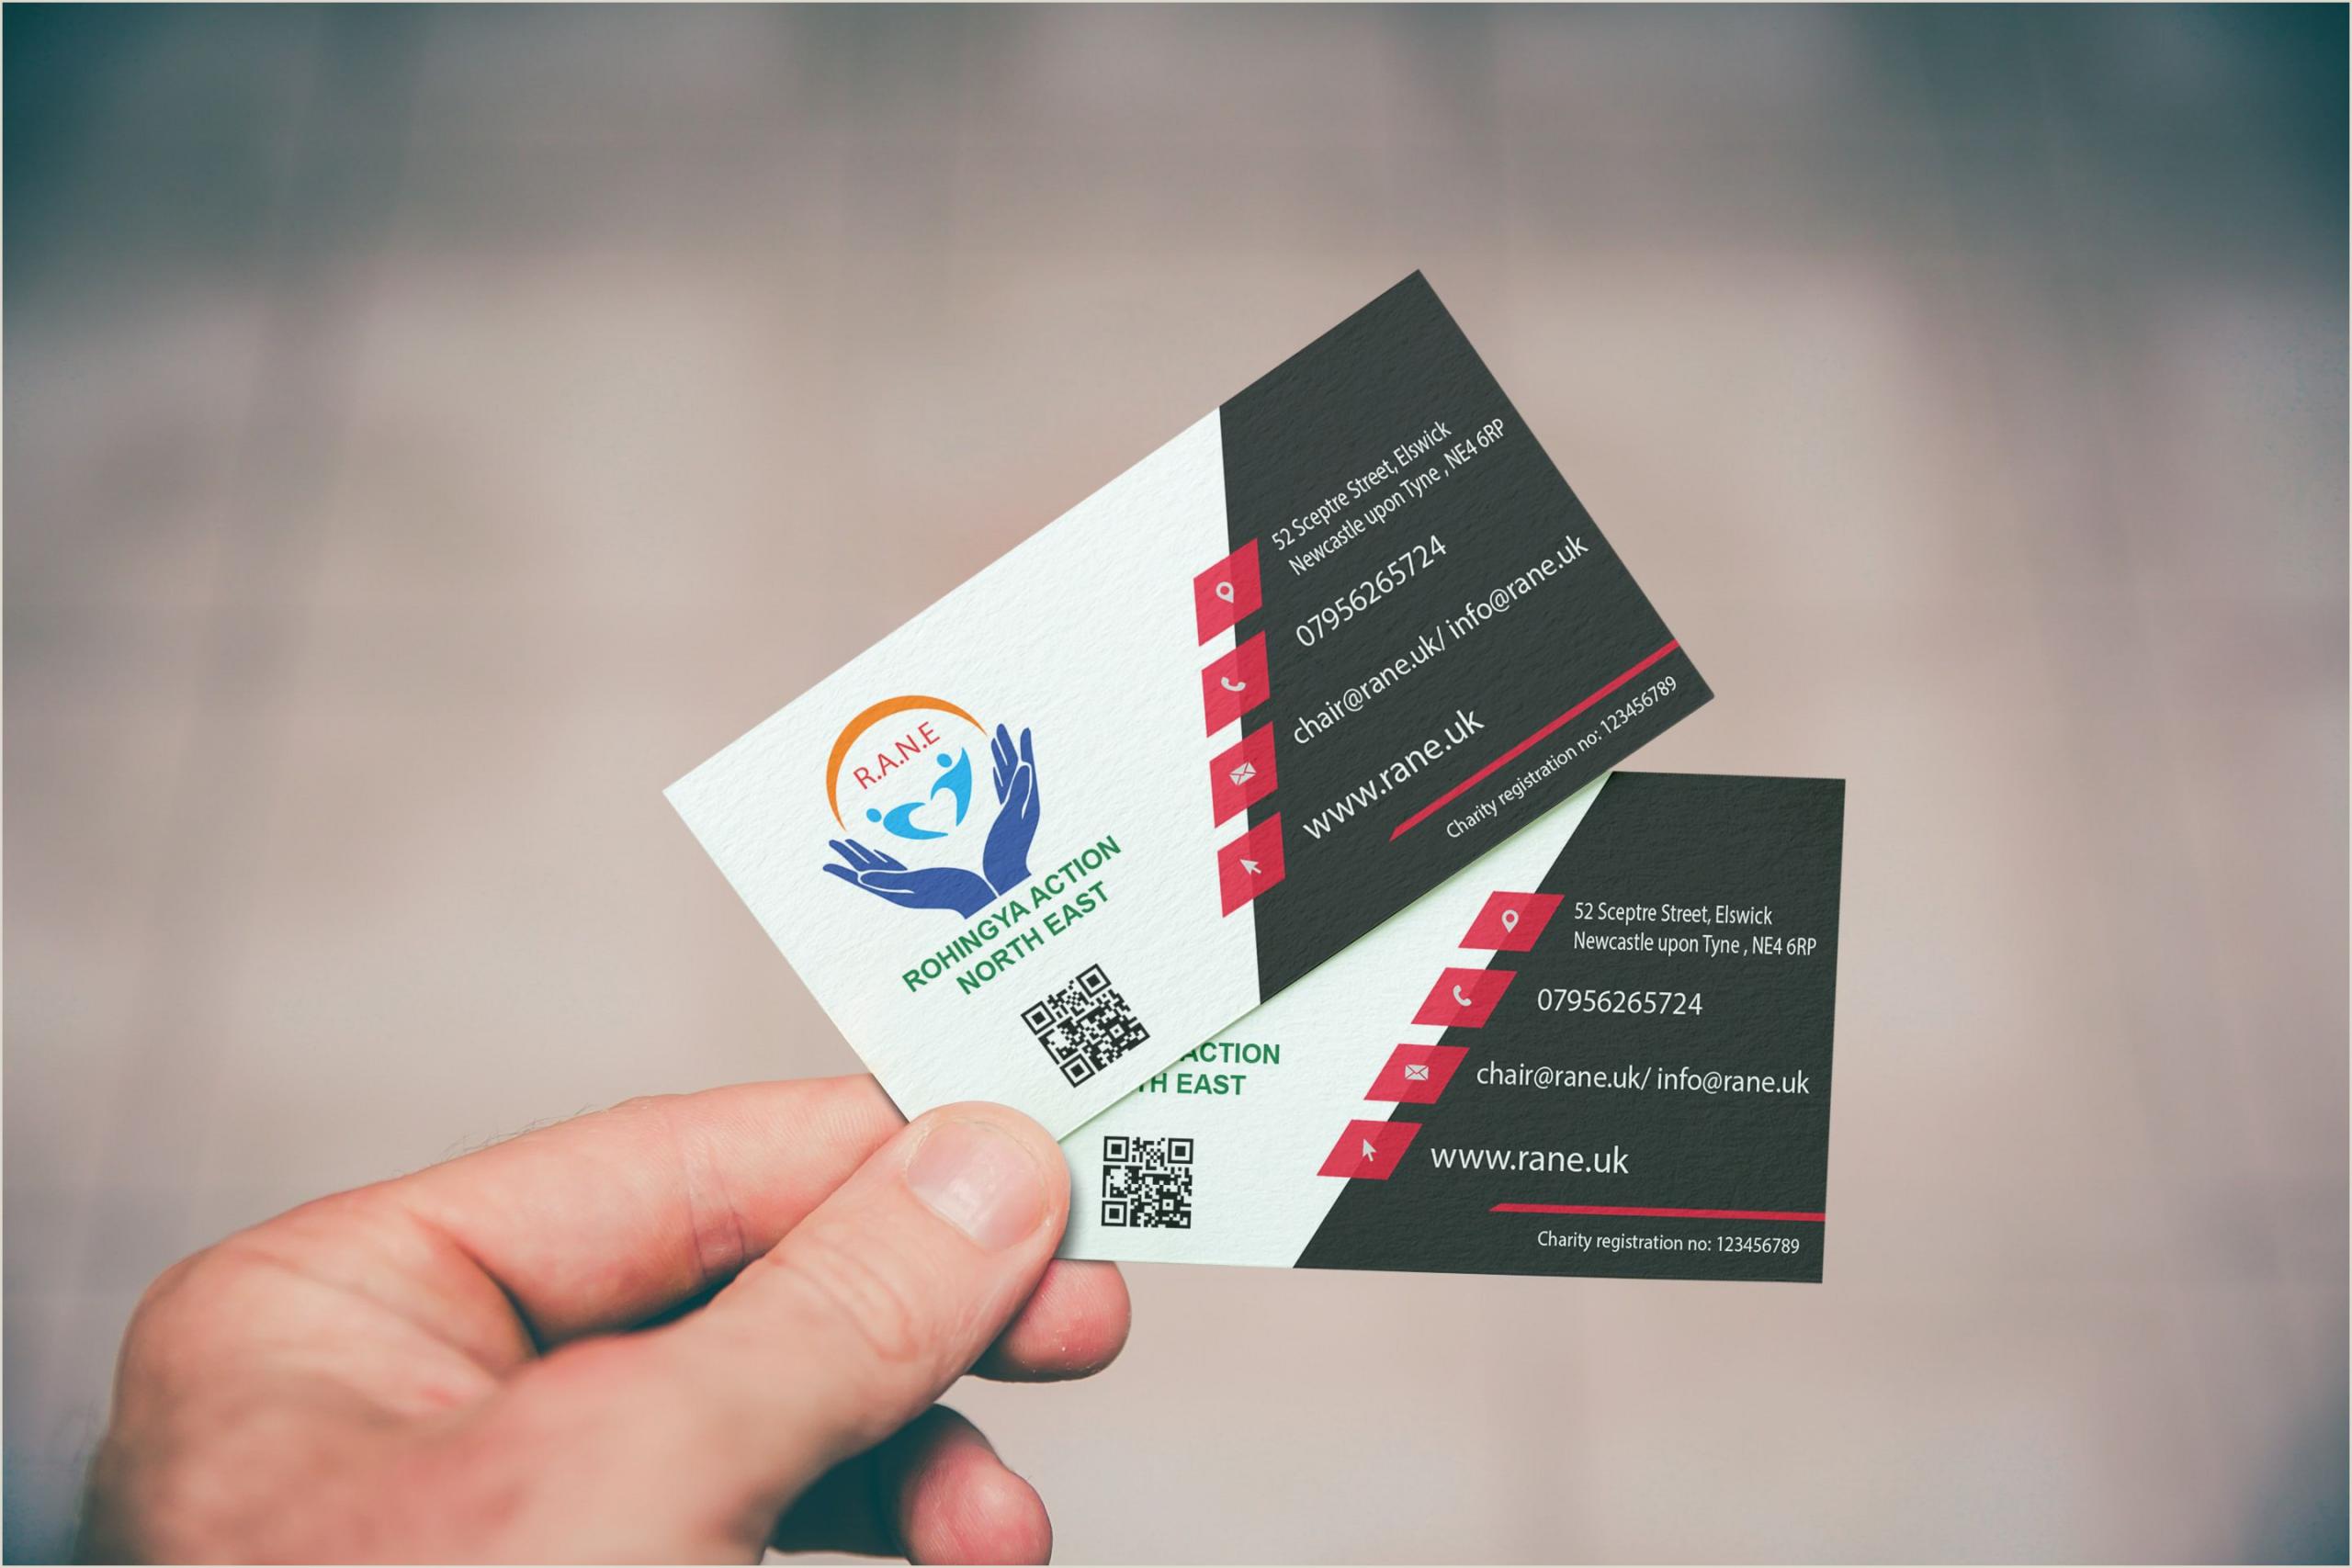 Idea Business Card Hi There I M A Professional Graphic Designer I Have 4